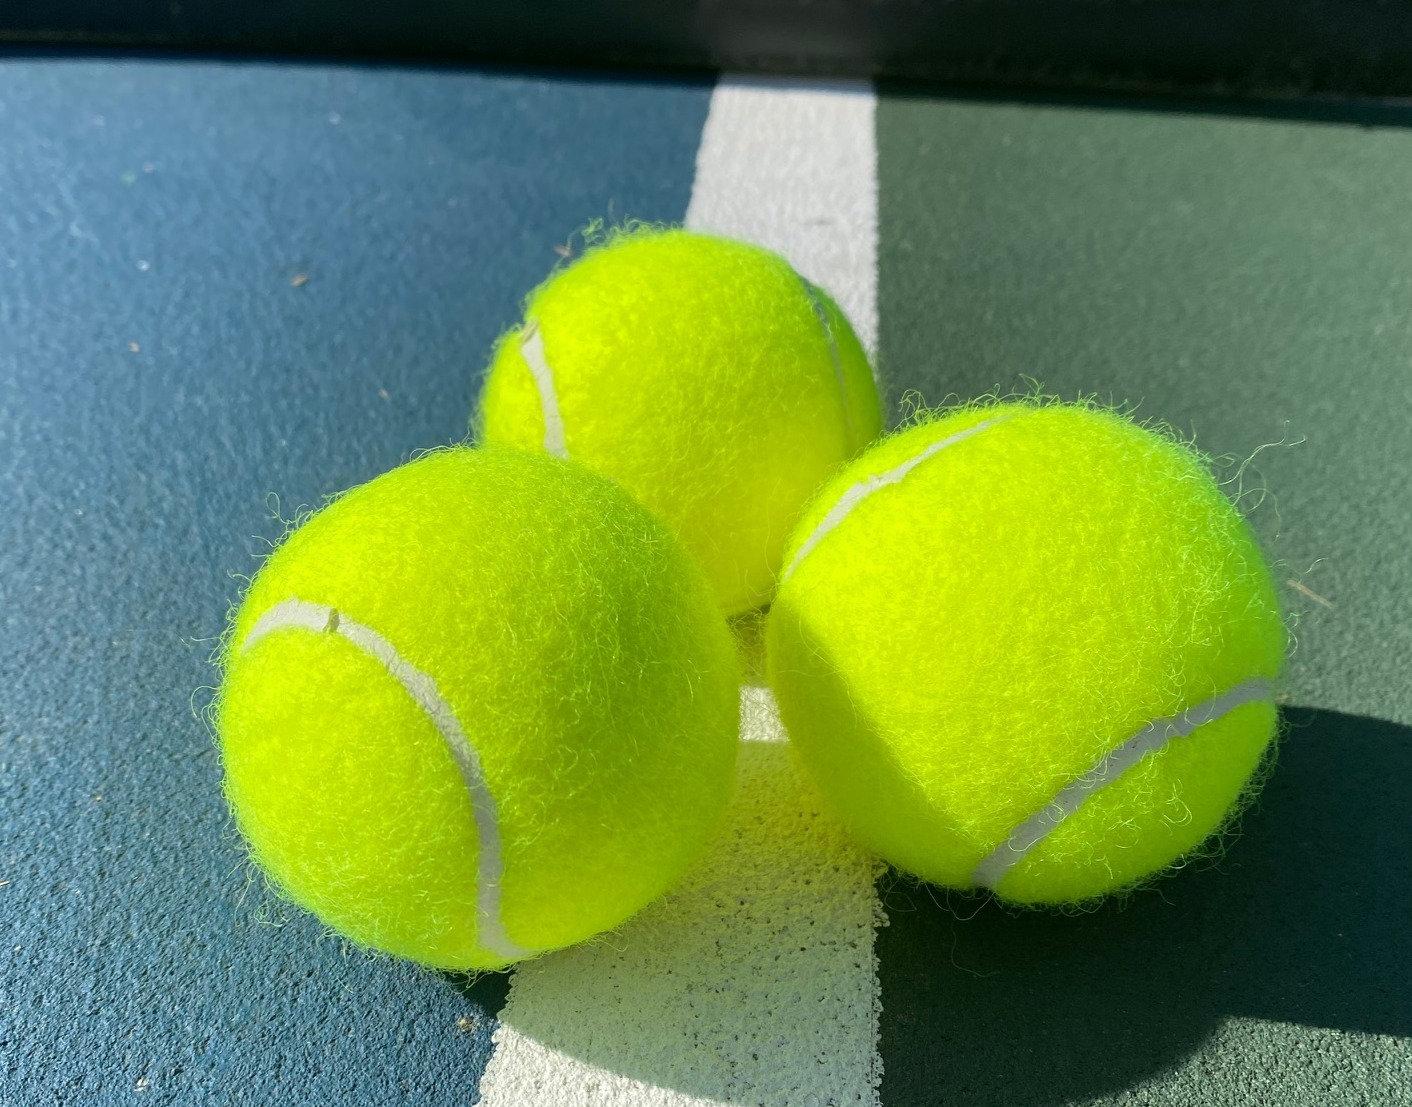 *FULLY BOOKED* Yellow Ball Beginner